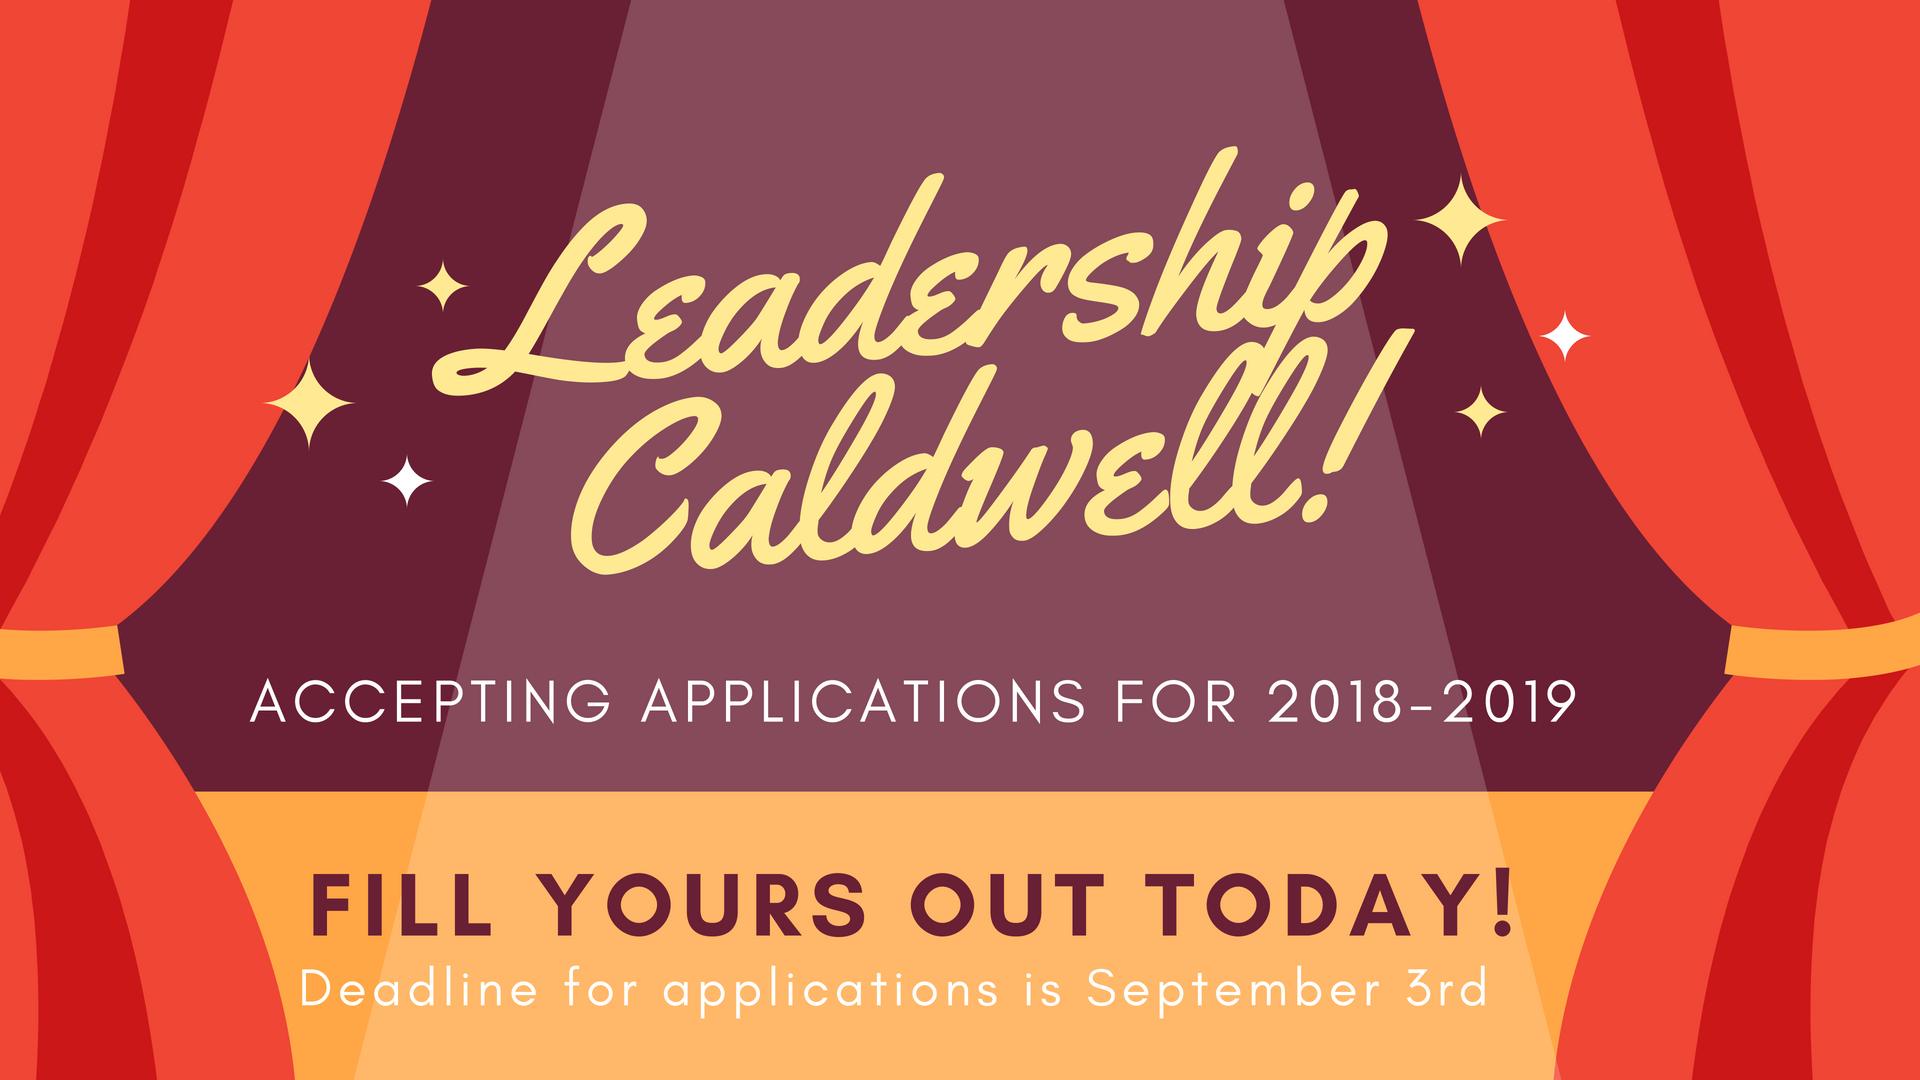 Leadership-Caldwell(1).jpg